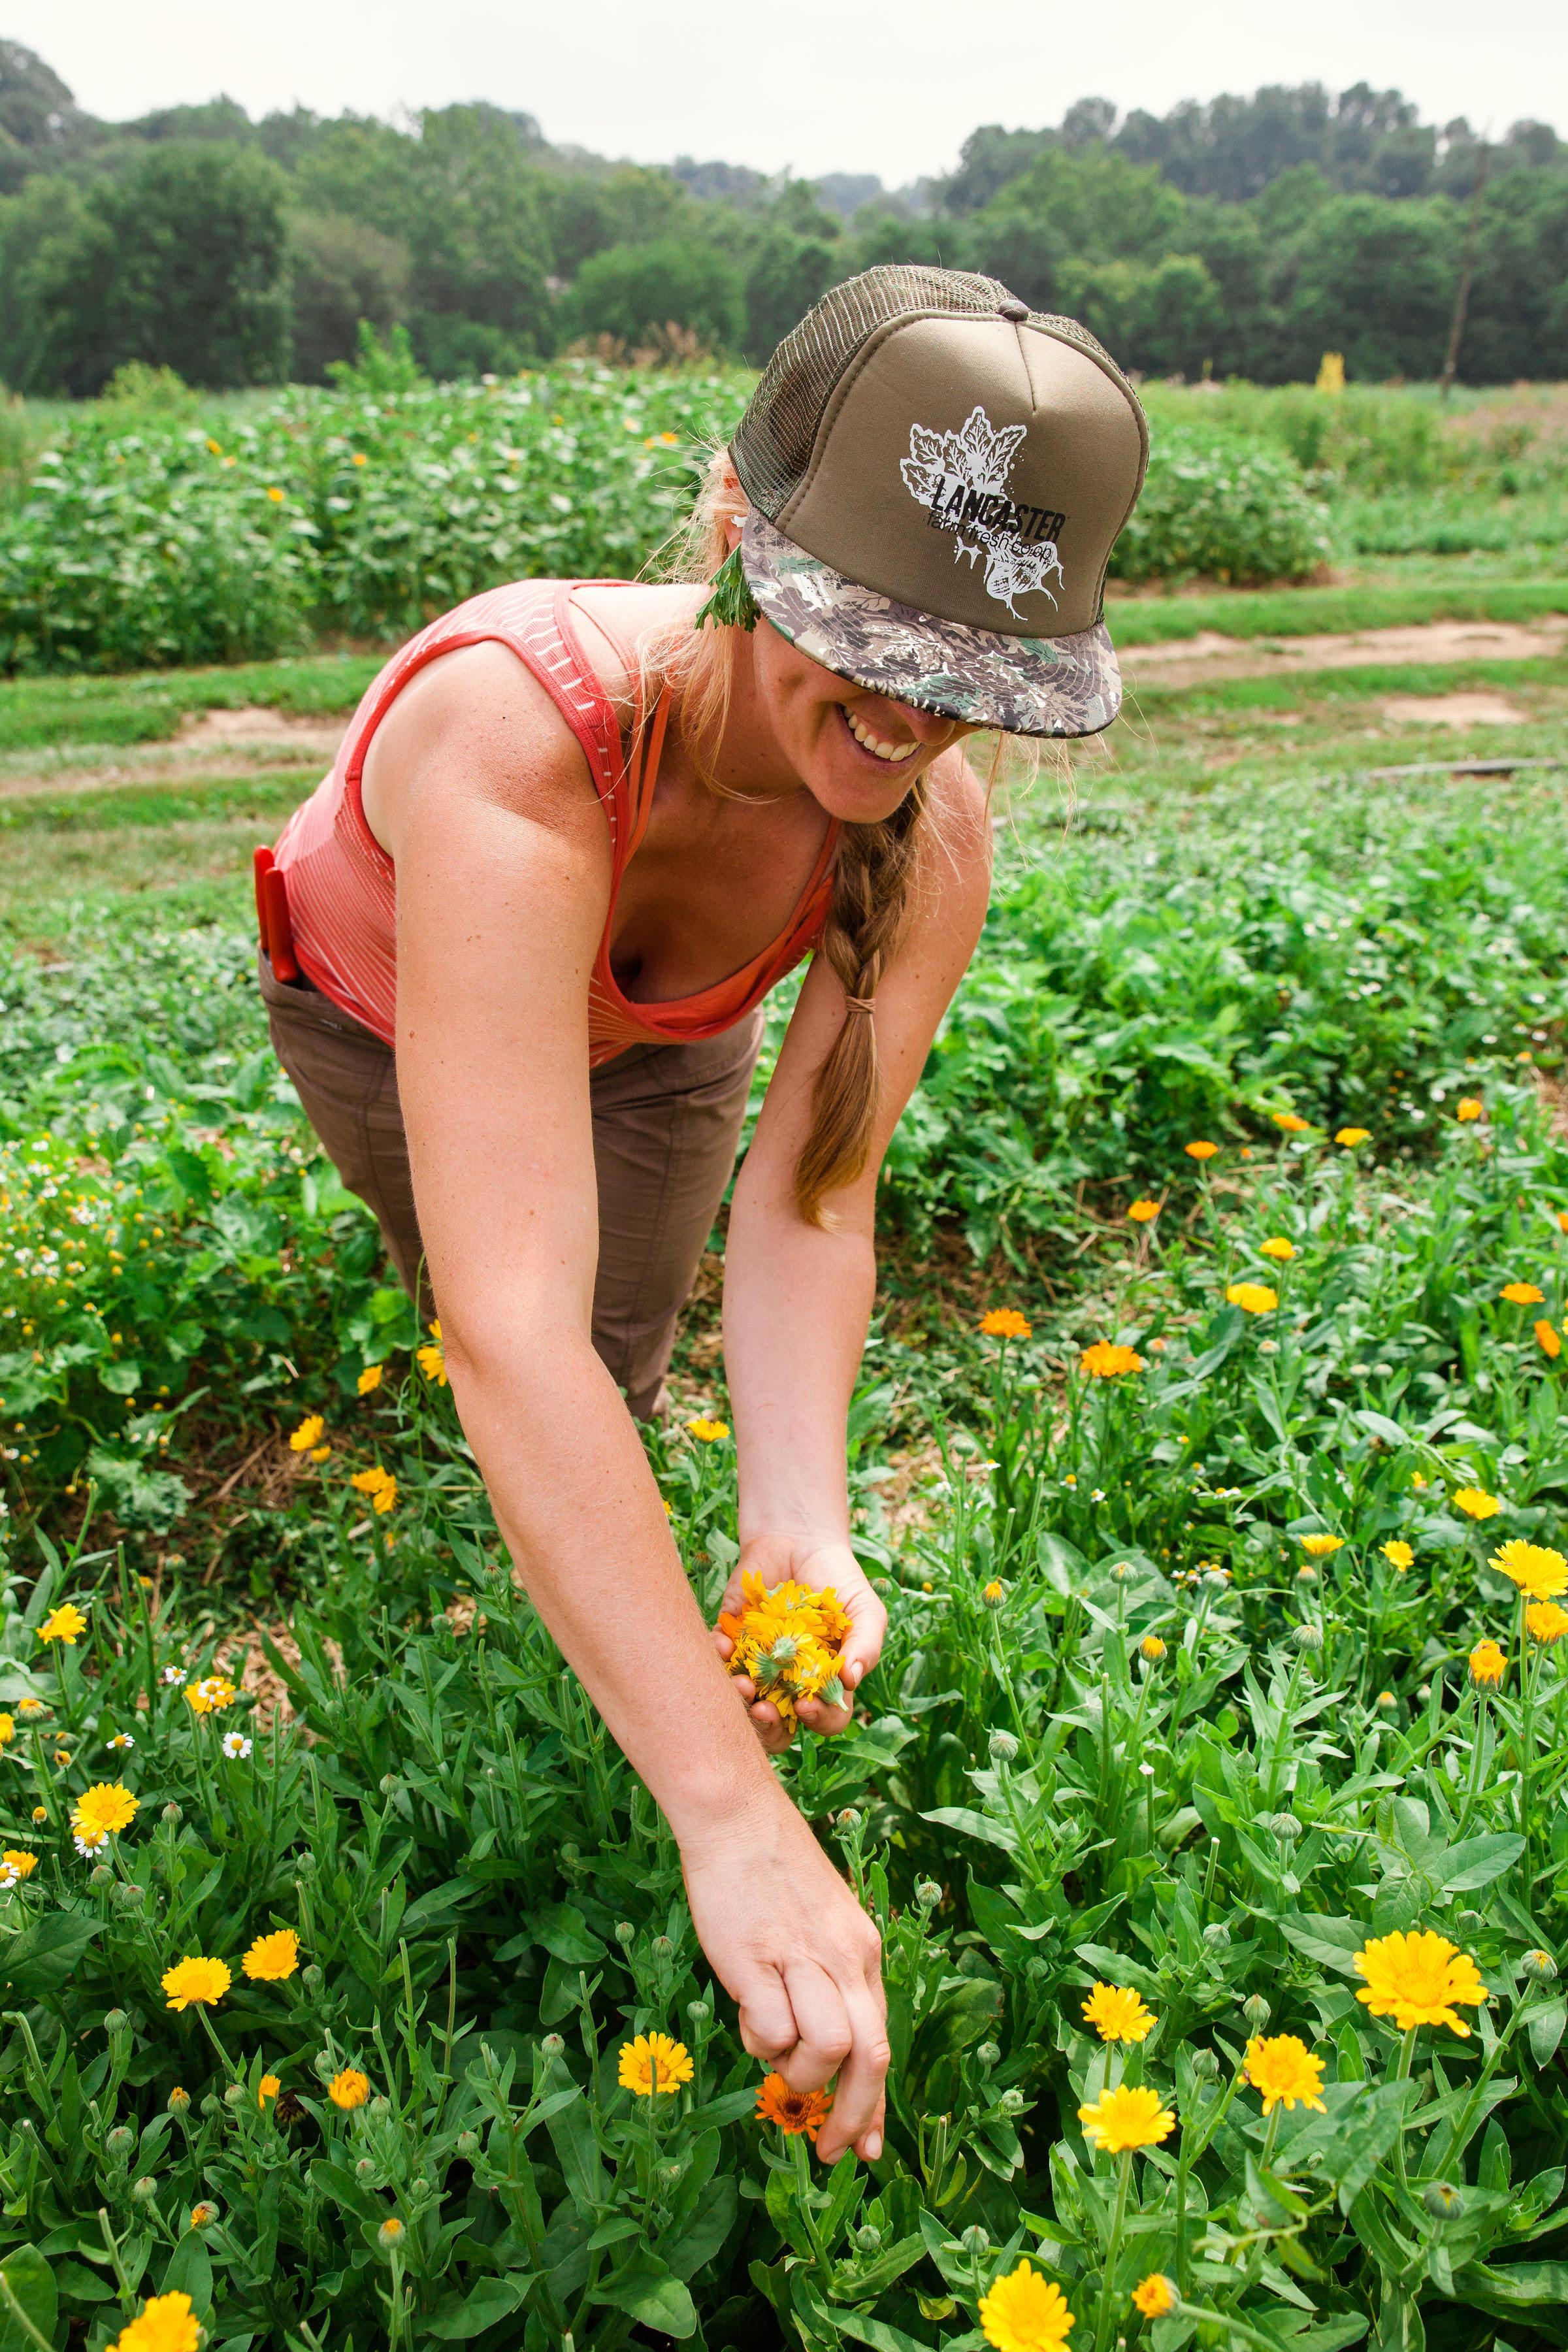 Elisabeth harvesting flowers.